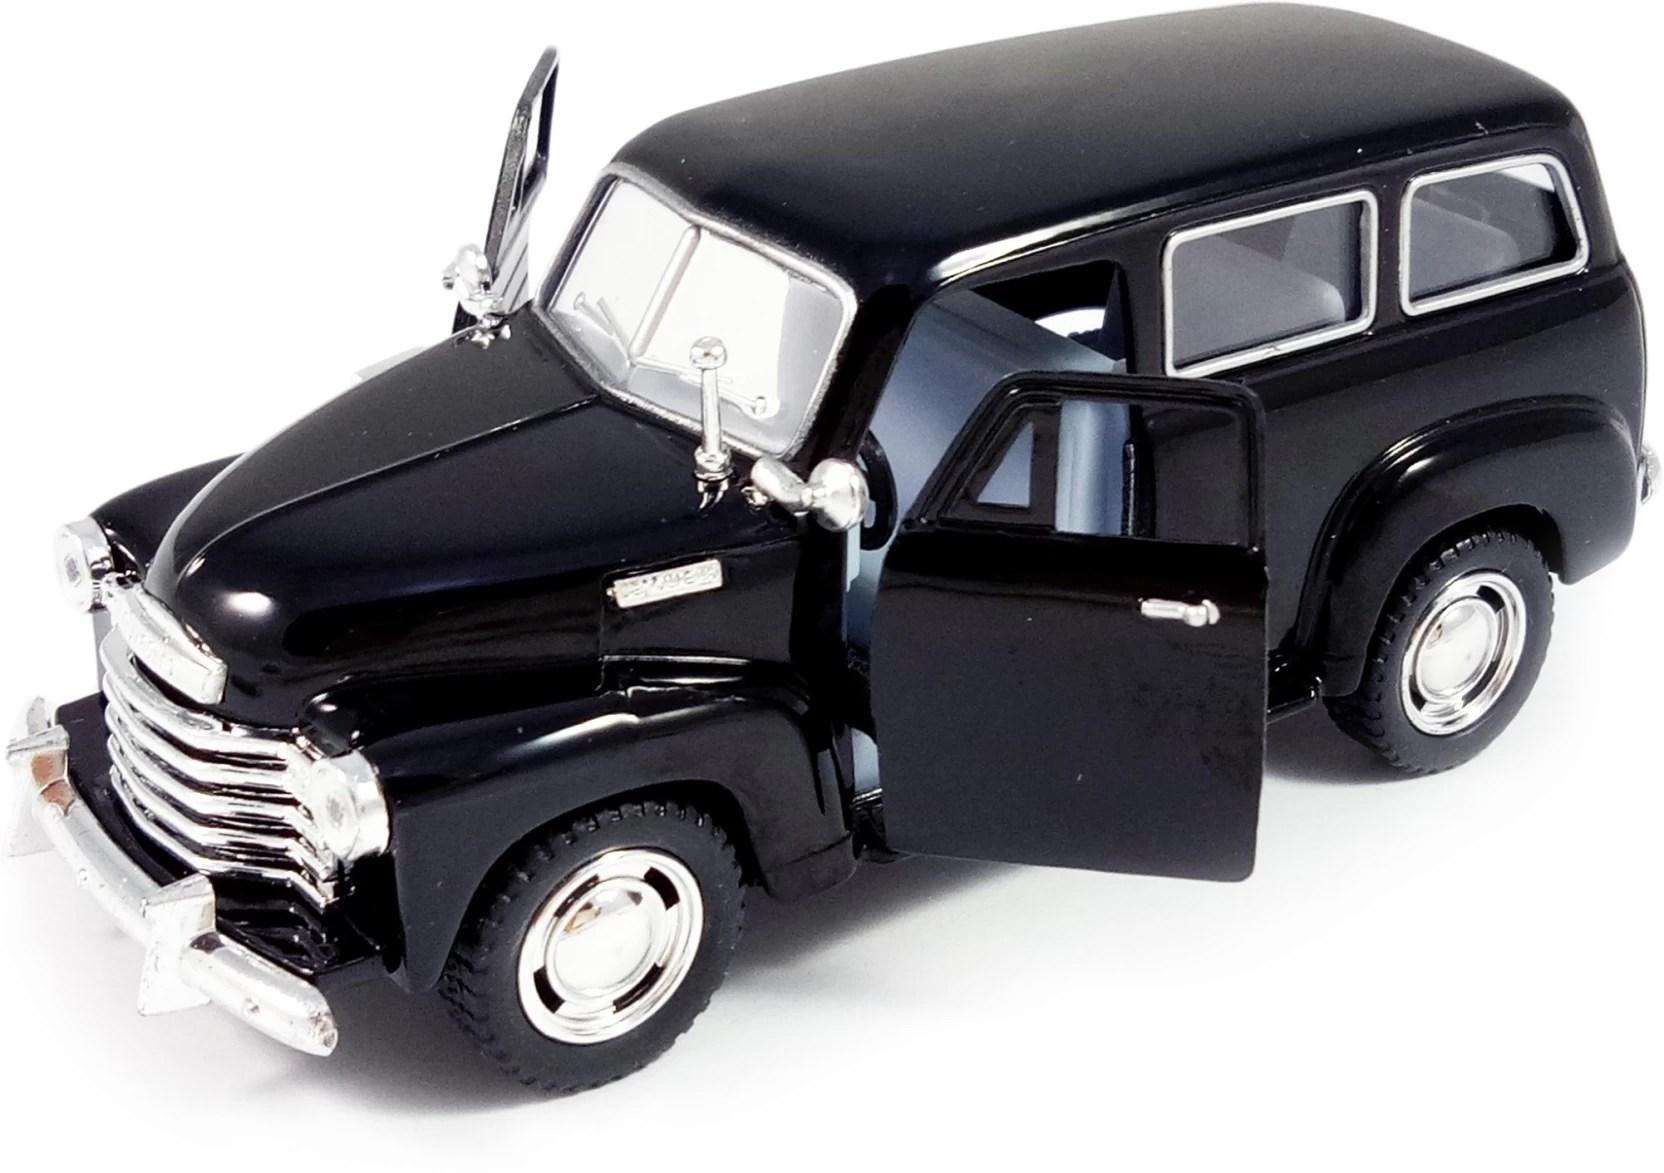 medium resolution of kinsmart 5 1 36 scale pull back action 1950 chevrolet suburban carryall car toys for kids from smiles creation black